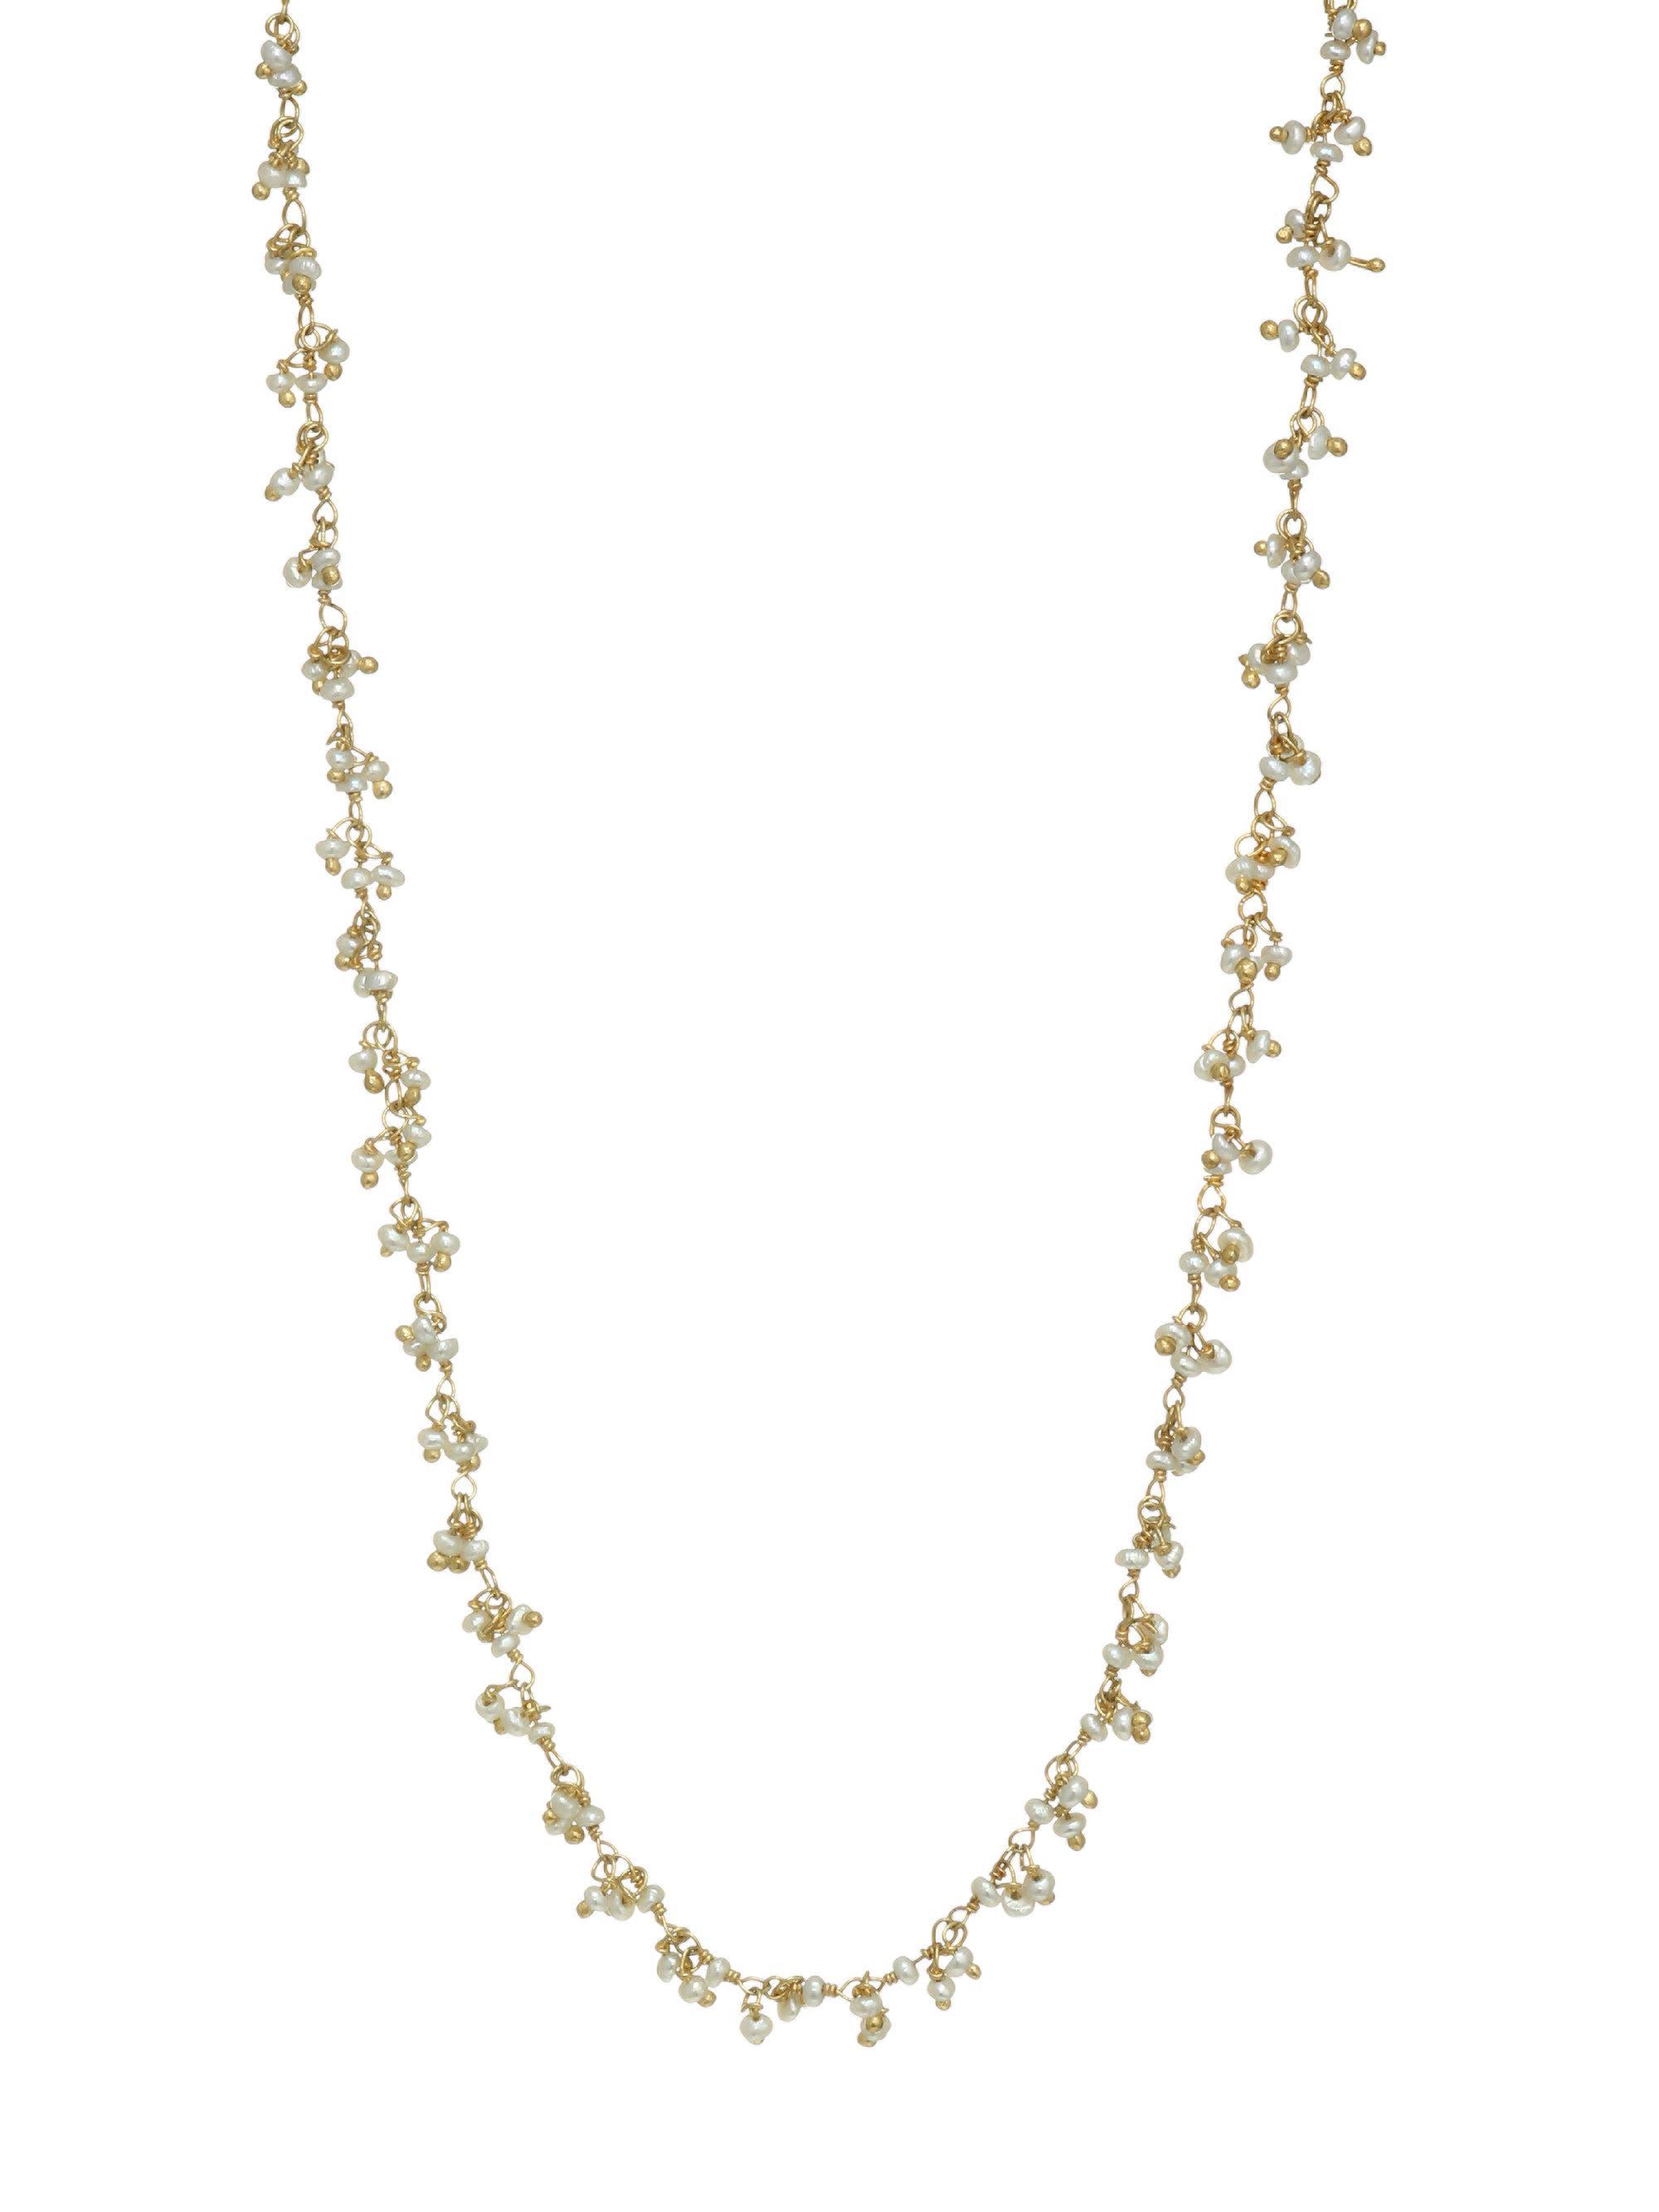 Chan Luu Mystic Layering Necklace RjLUhJ